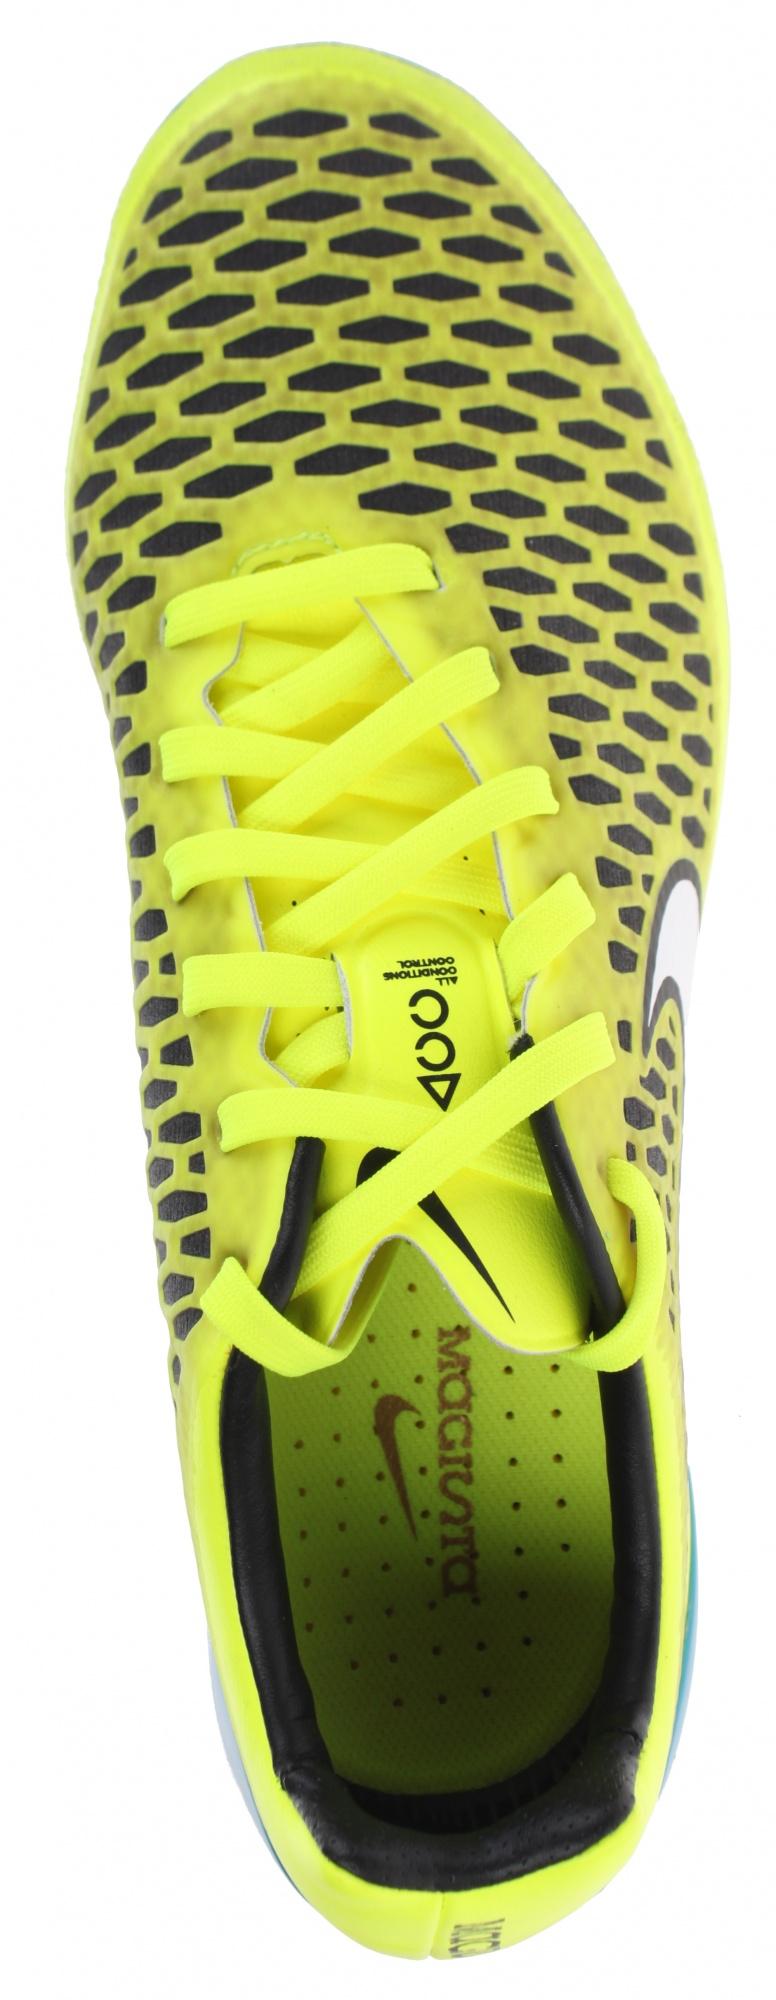 Nike voetbalschoenen Magista Opus AGR geel dames Internet